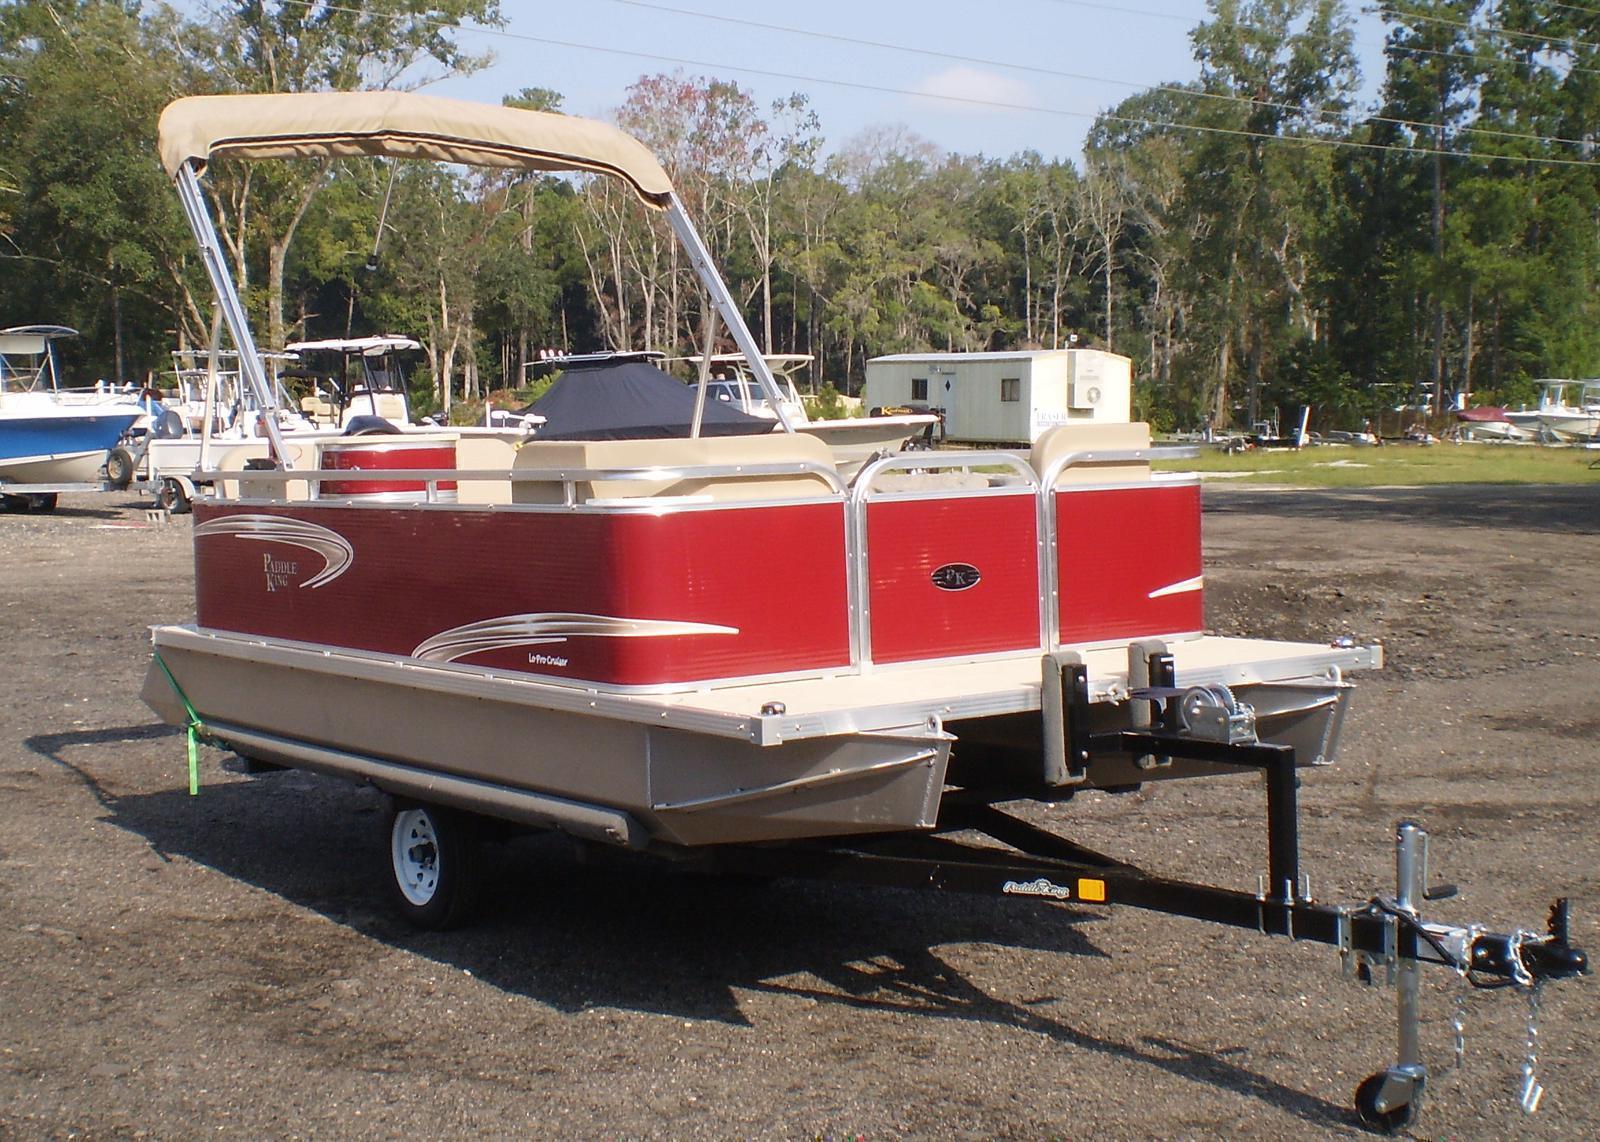 Paddle King Inc. Low Pro Cruiser